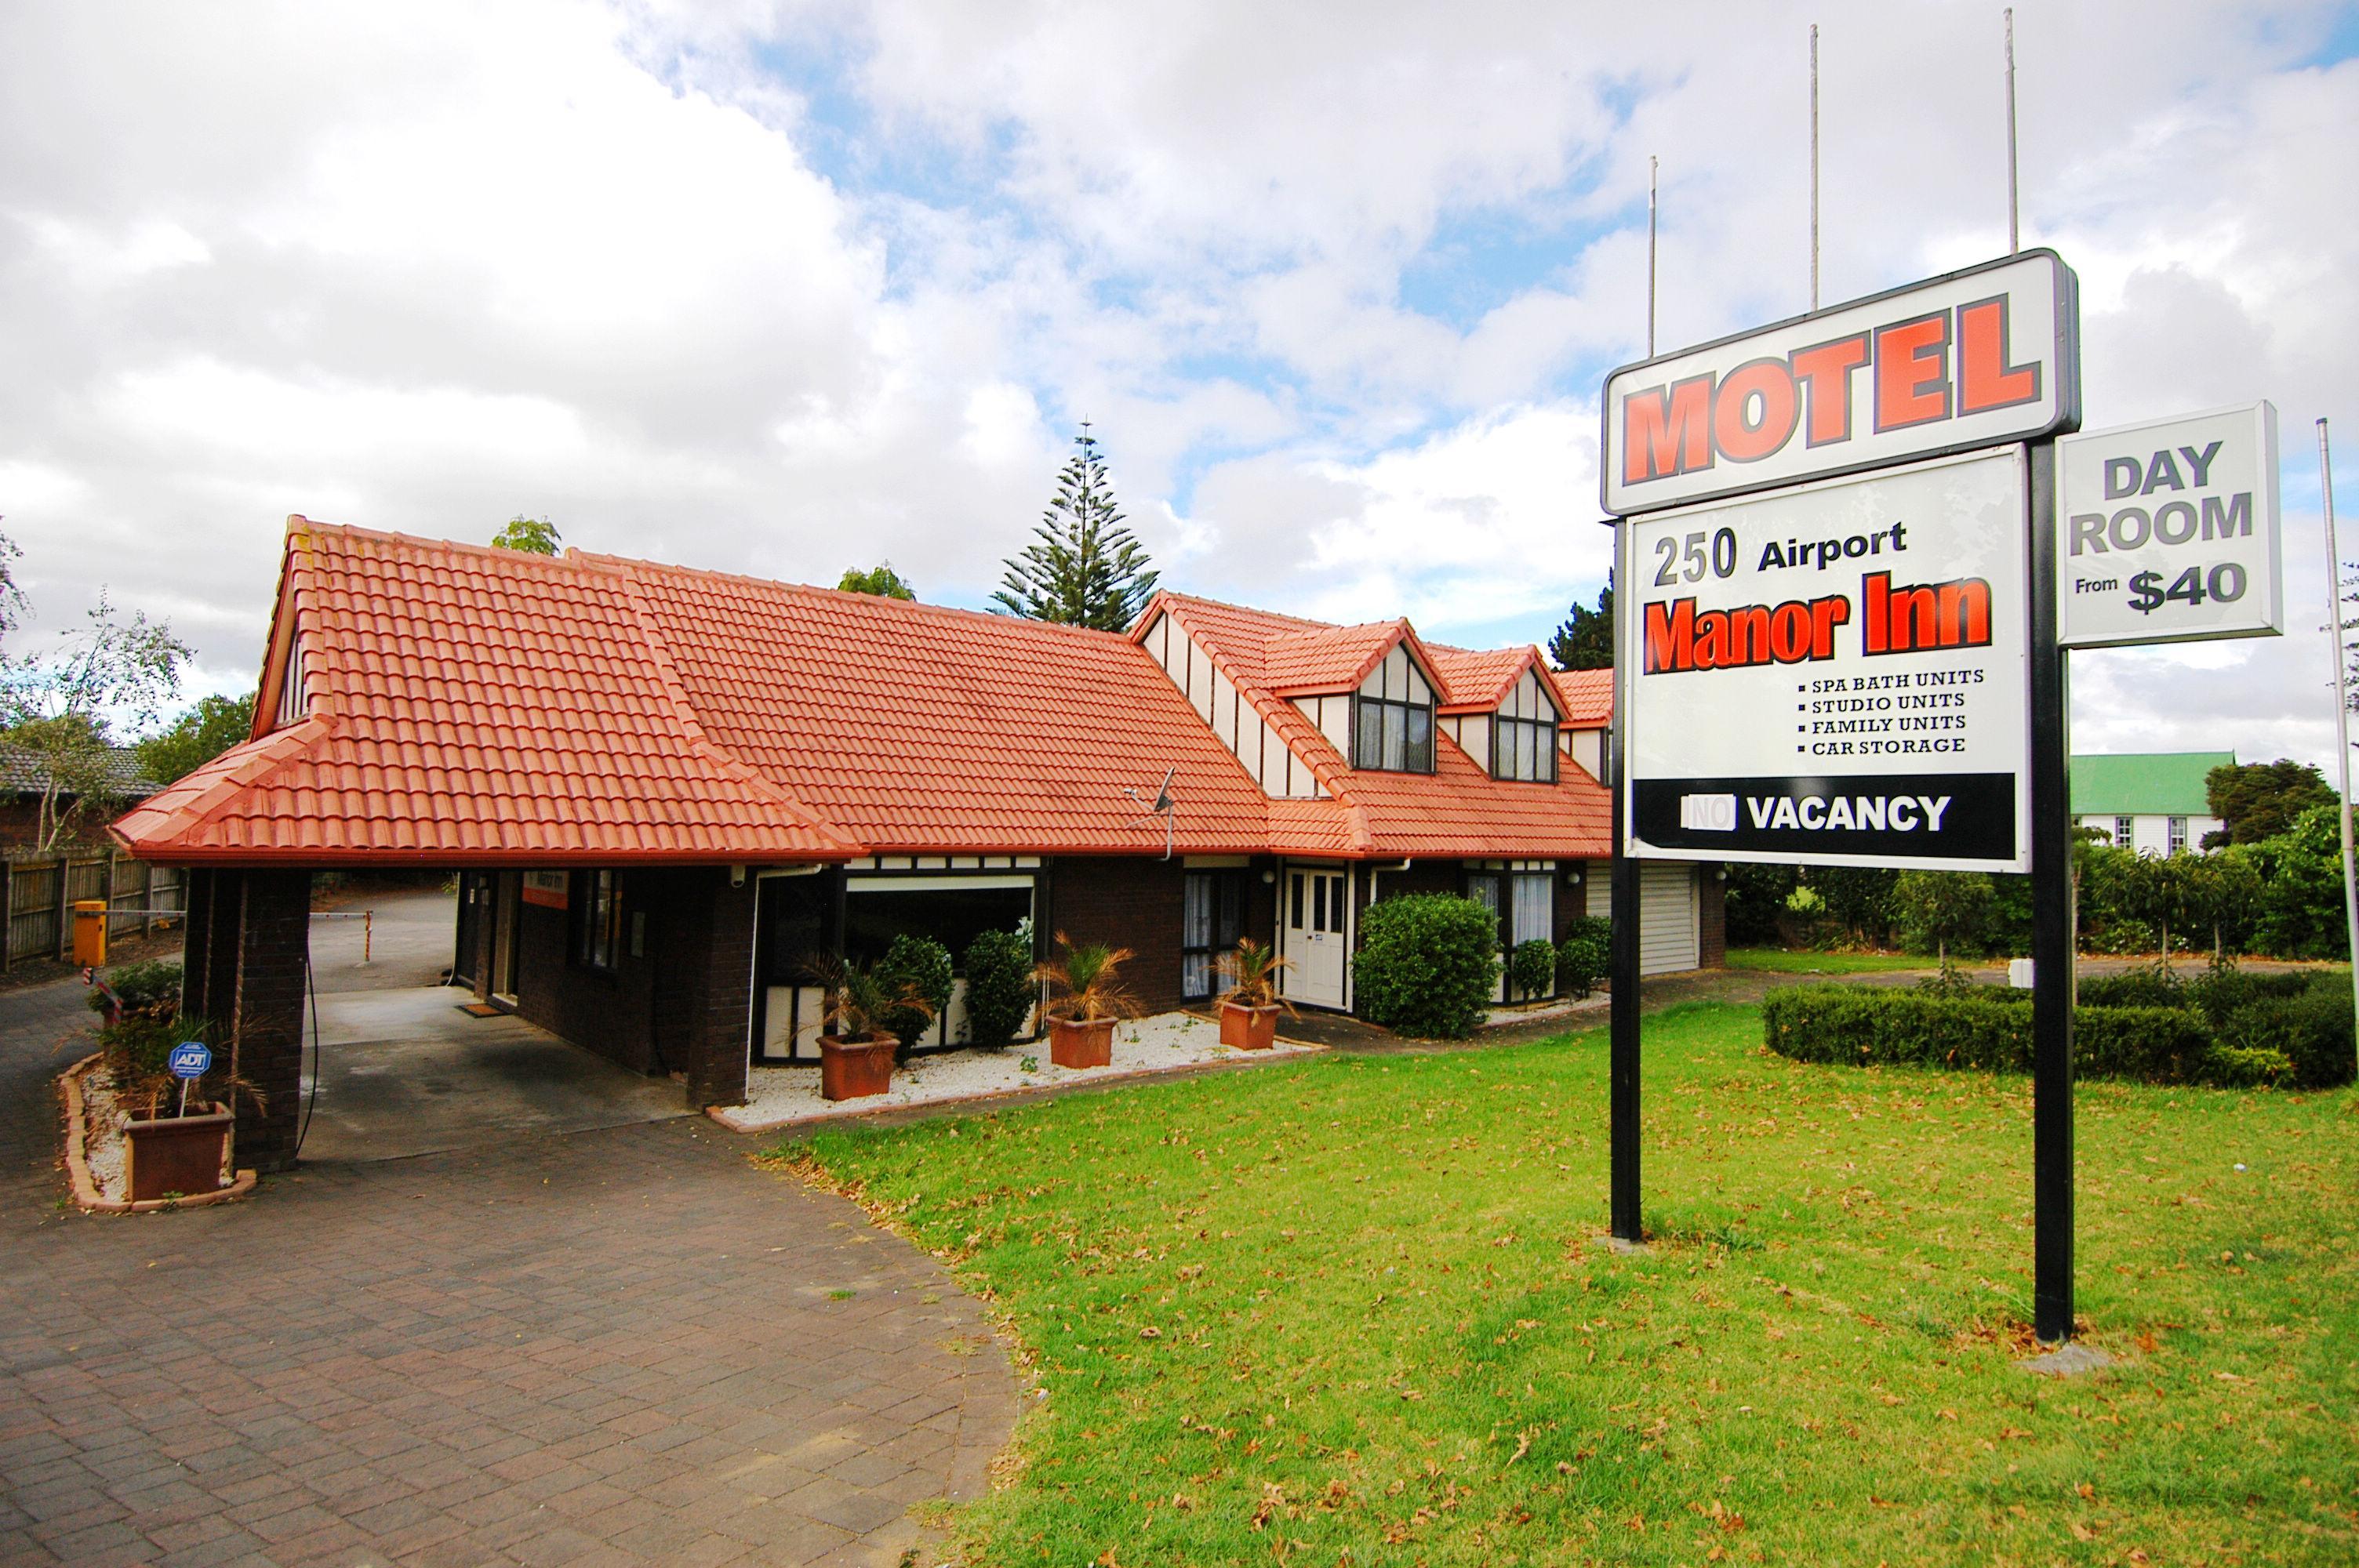 Airport Manor Inn